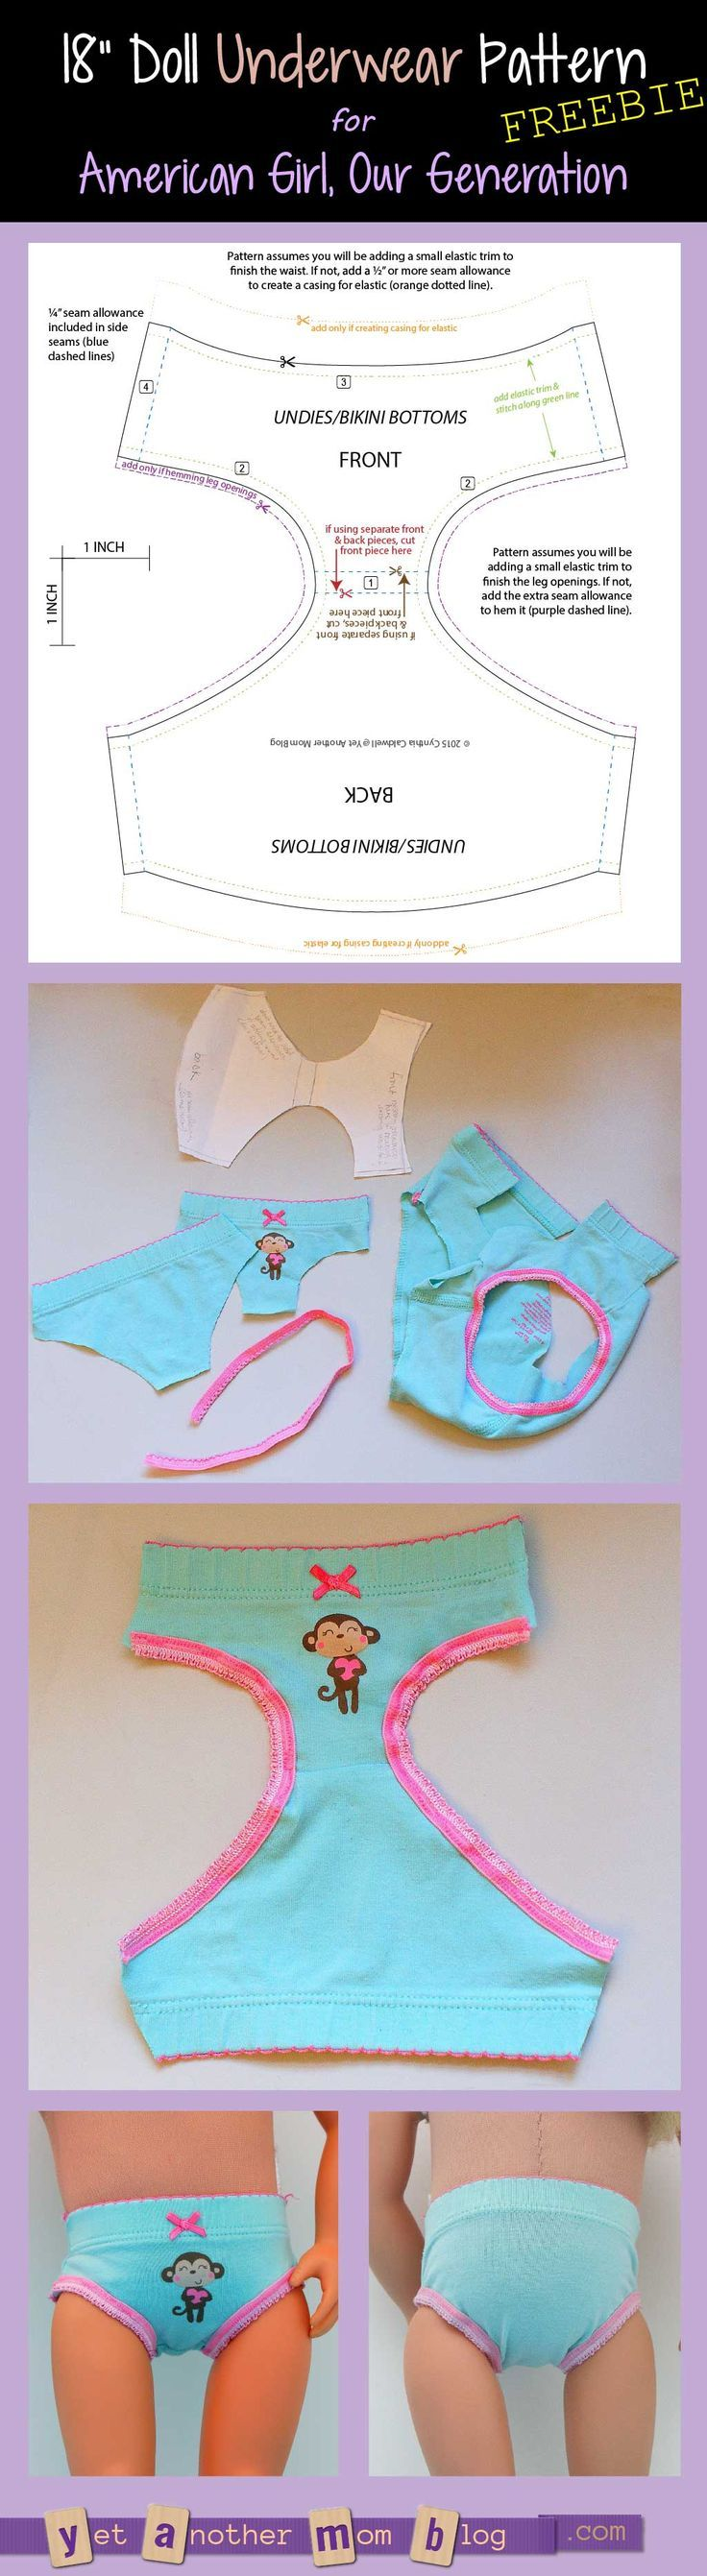 American Girl/Our Generation Doll underwear pattern freebie